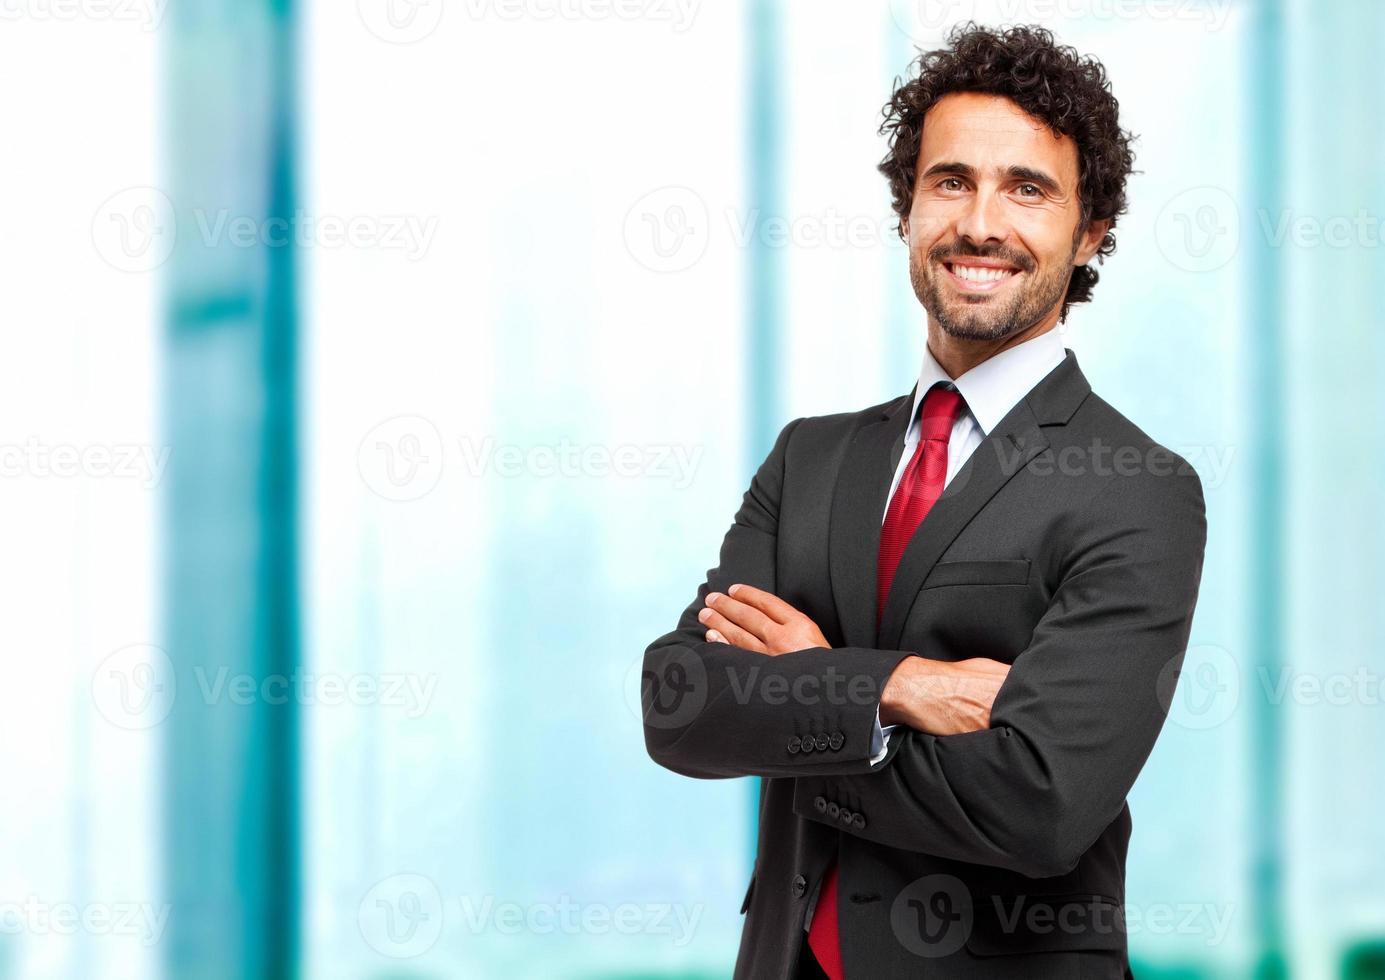 selbstbewusster männlicher Manager foto